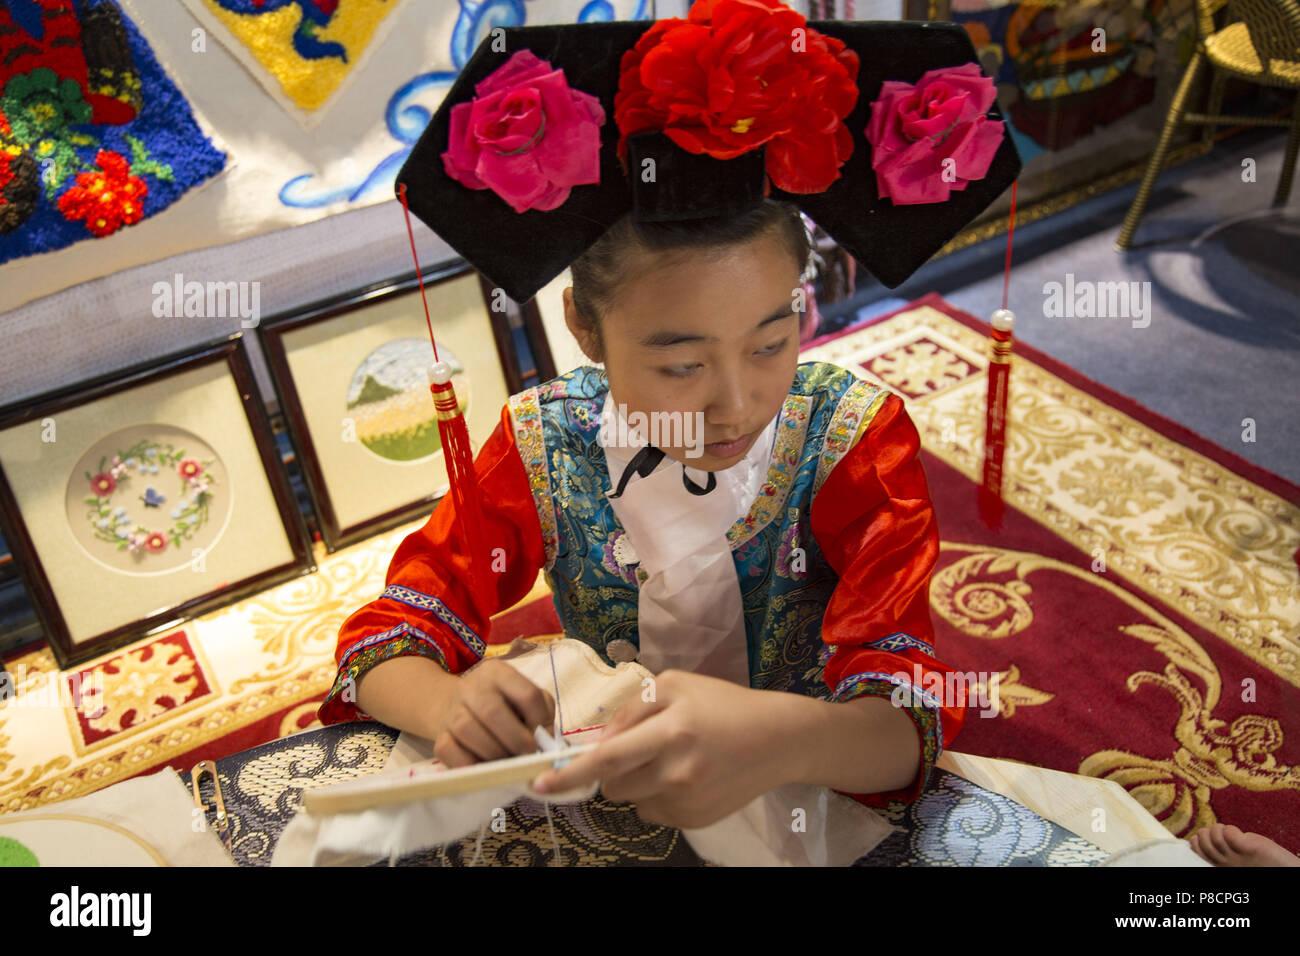 Jili, China. July 11, 2018. The embroidery artworks in northeast China's Jilin Province. Credit: SIPA Asia/ZUMA Wire/Alamy Live News - Stock Image